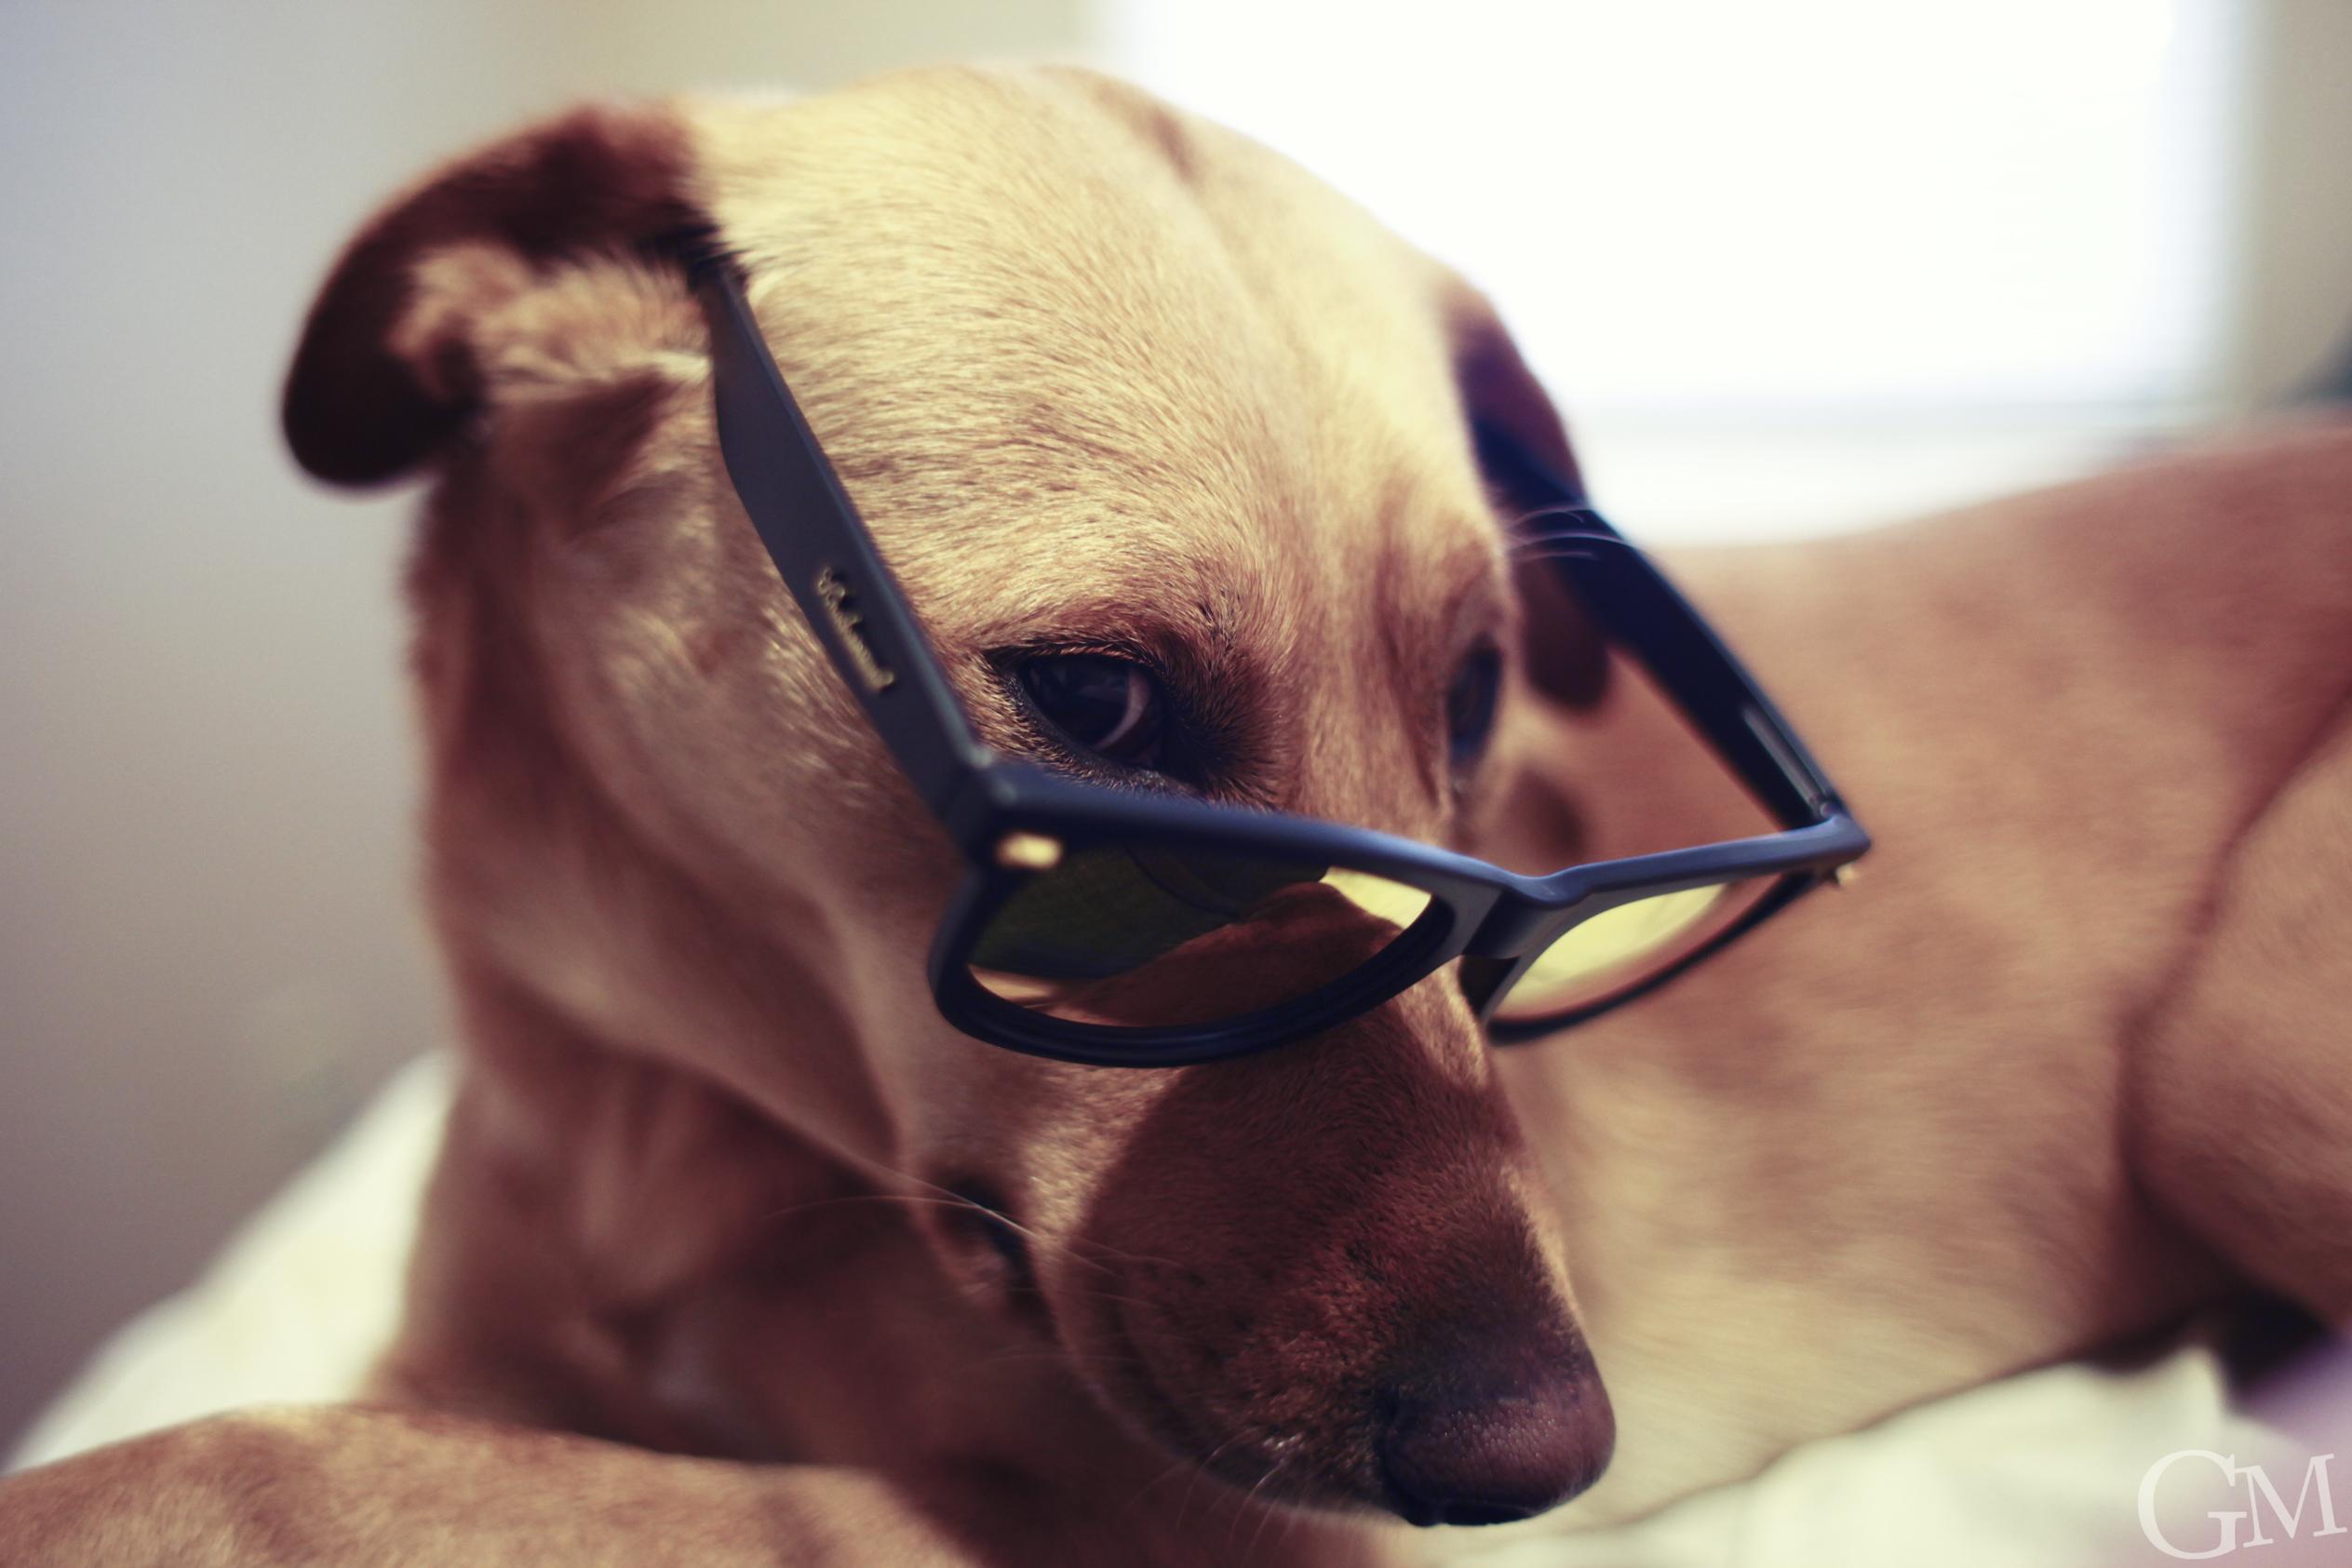 Fondos de pantalla : negro, Gafas de sol, gafas, perro, fotógrafo ...